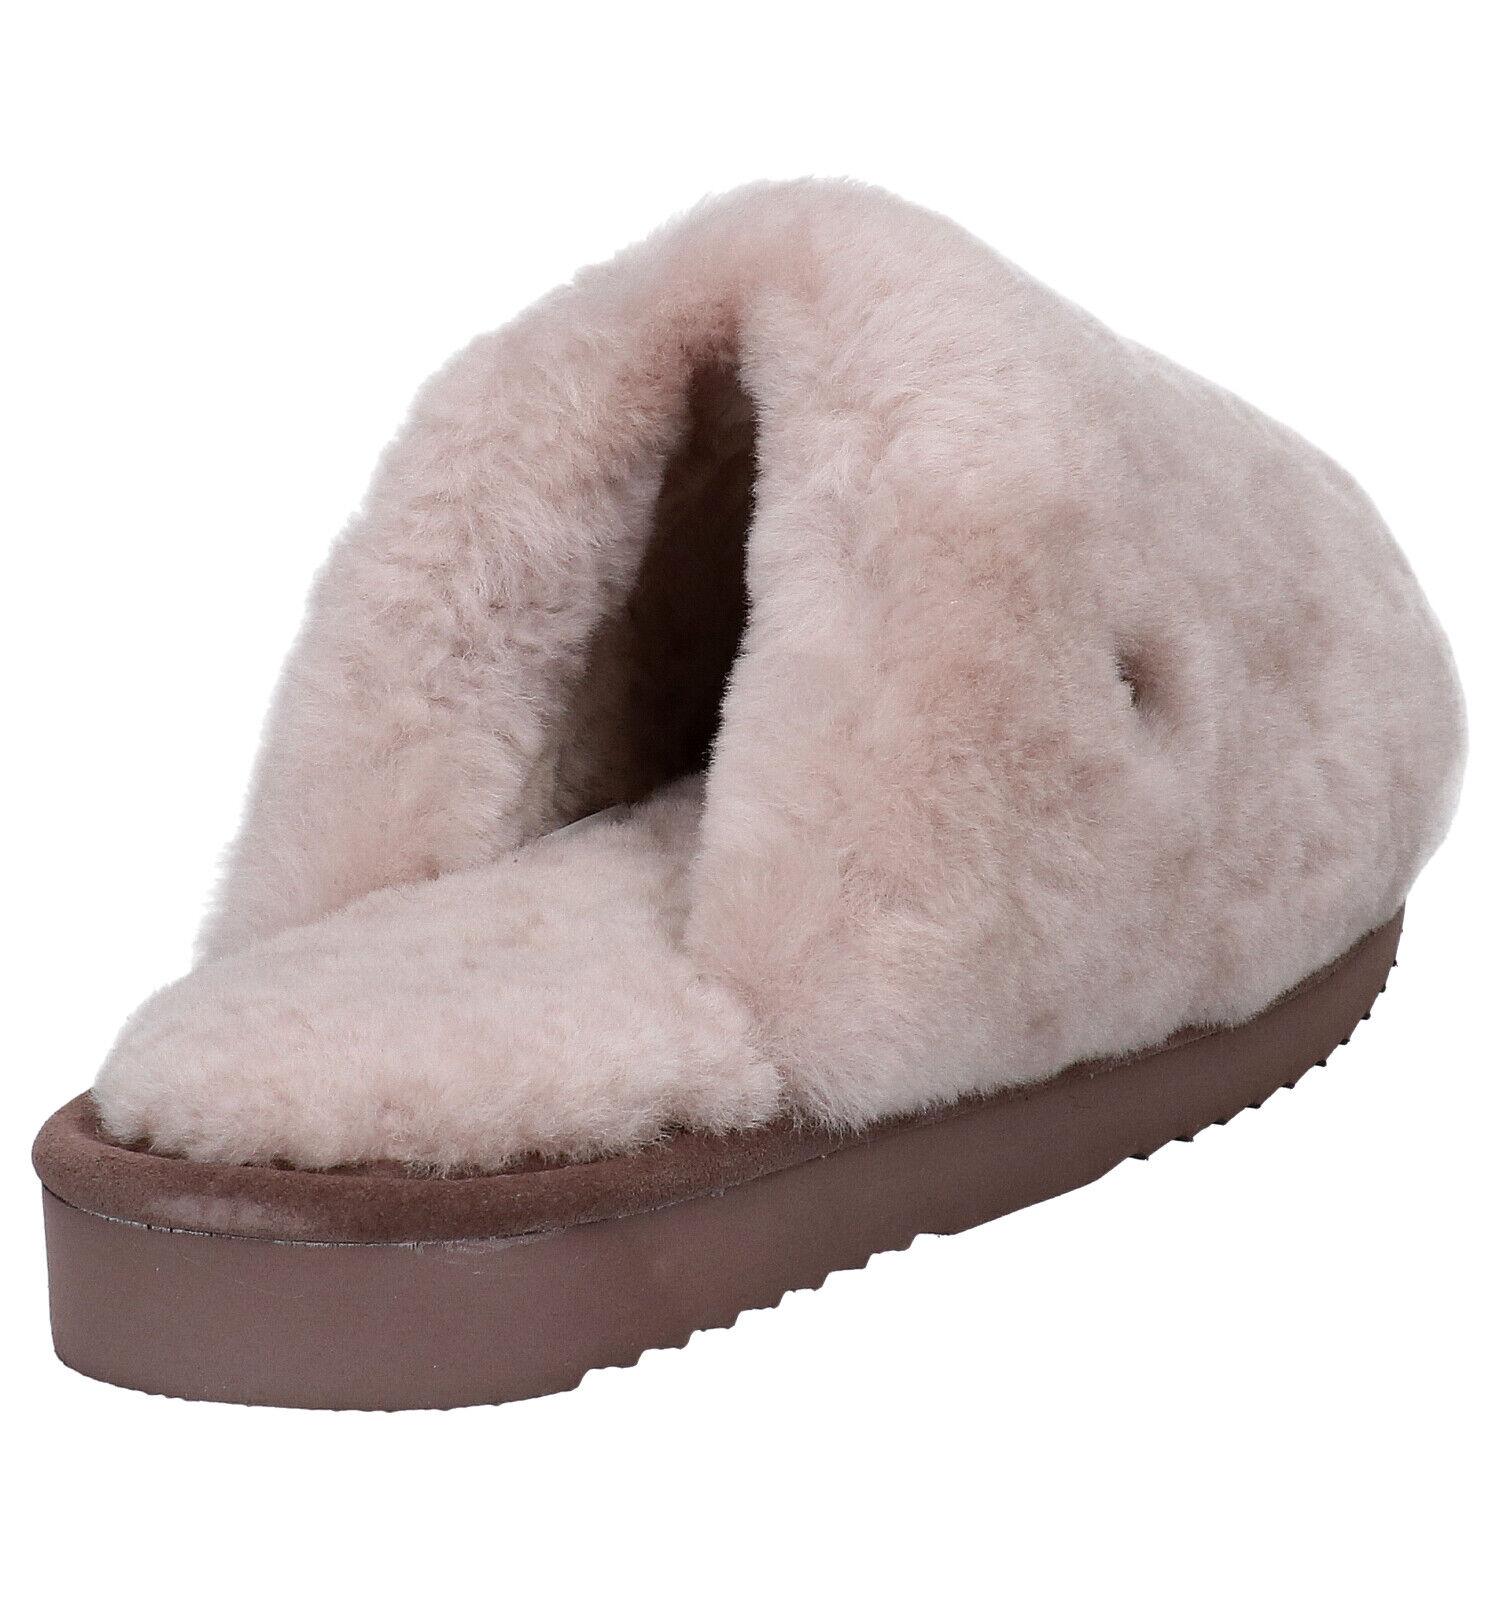 Warmbat Mungo Roze Pantoffels